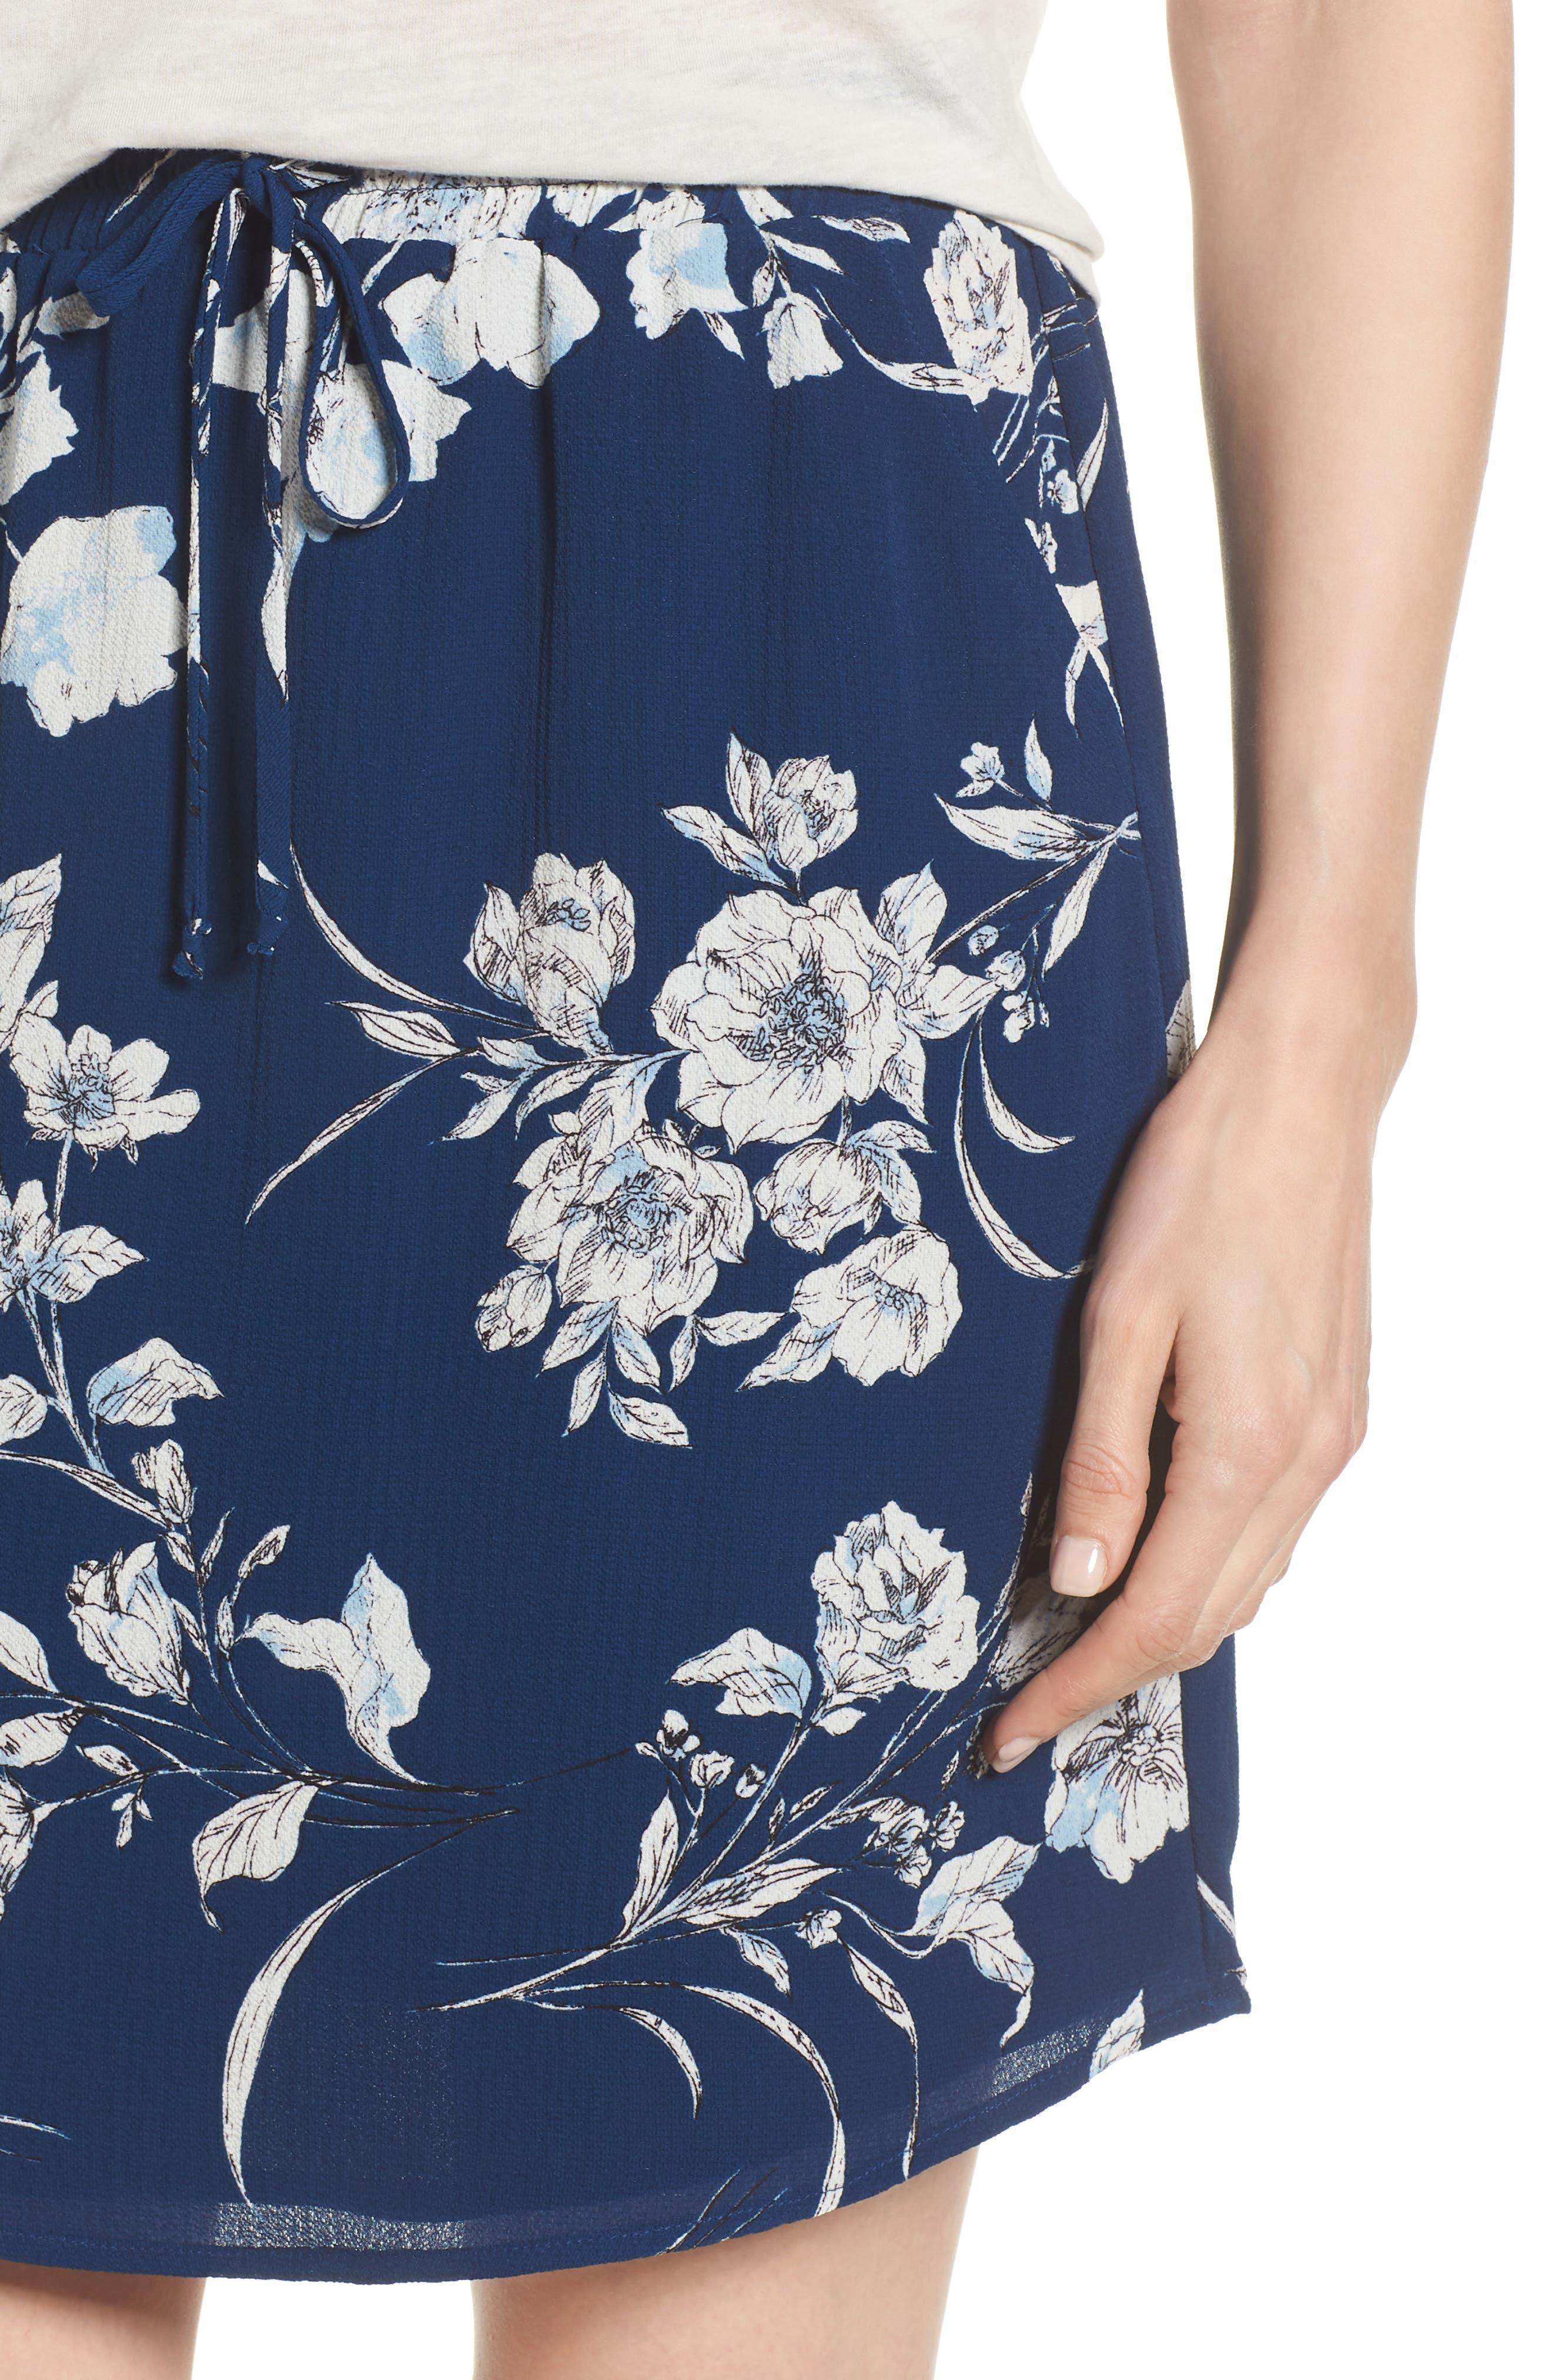 x Hi Sugarplum! Monterey Easy Skirt,                             Alternate thumbnail 5, color,                             Cool Breeze Floral